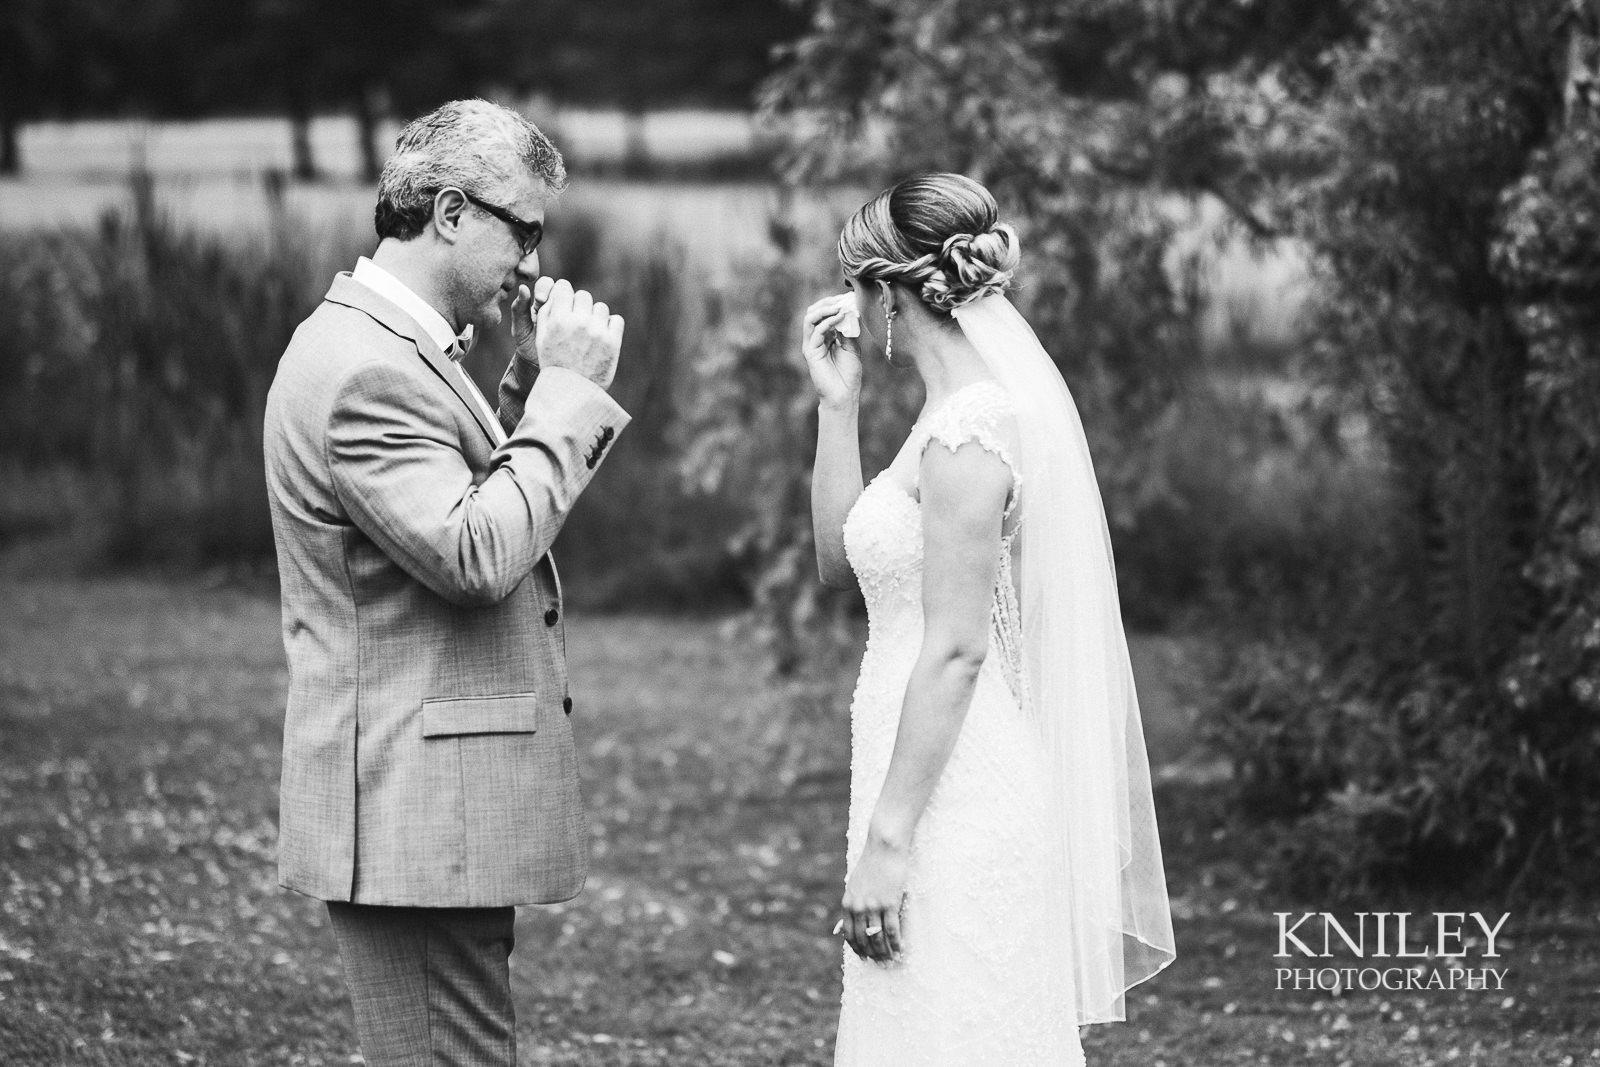 024 - Ontario Golf Club Wedding Pictures - XT2A6532.jpg